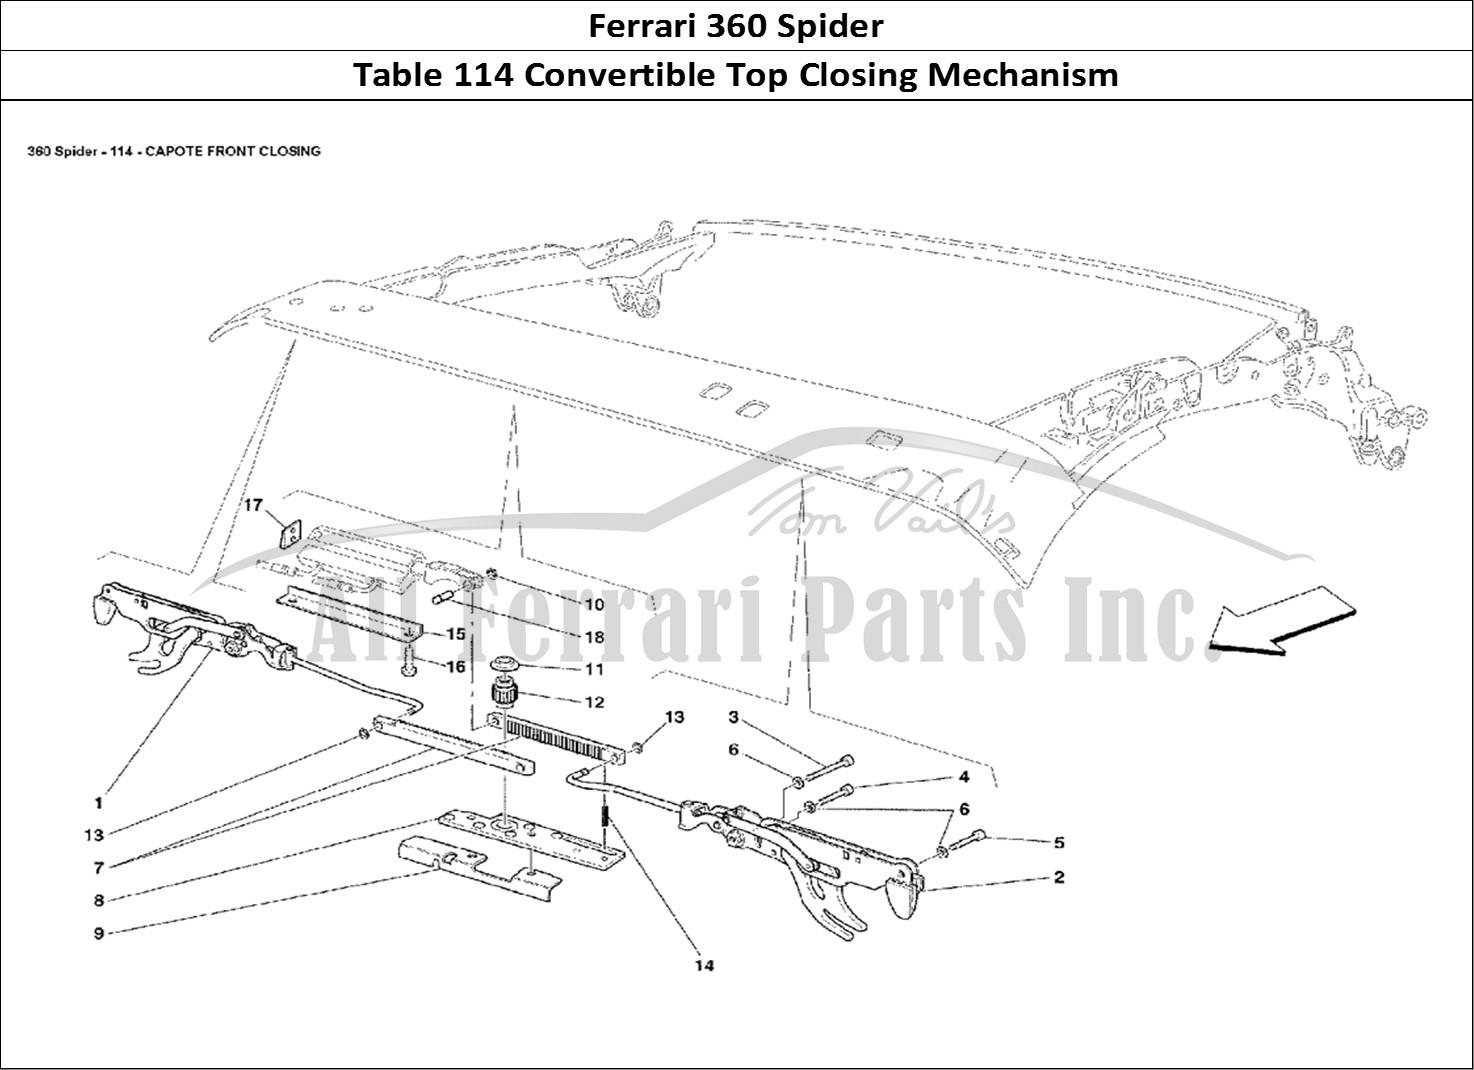 Buy Original Ferrari 360 Spider 114 Convertible Top